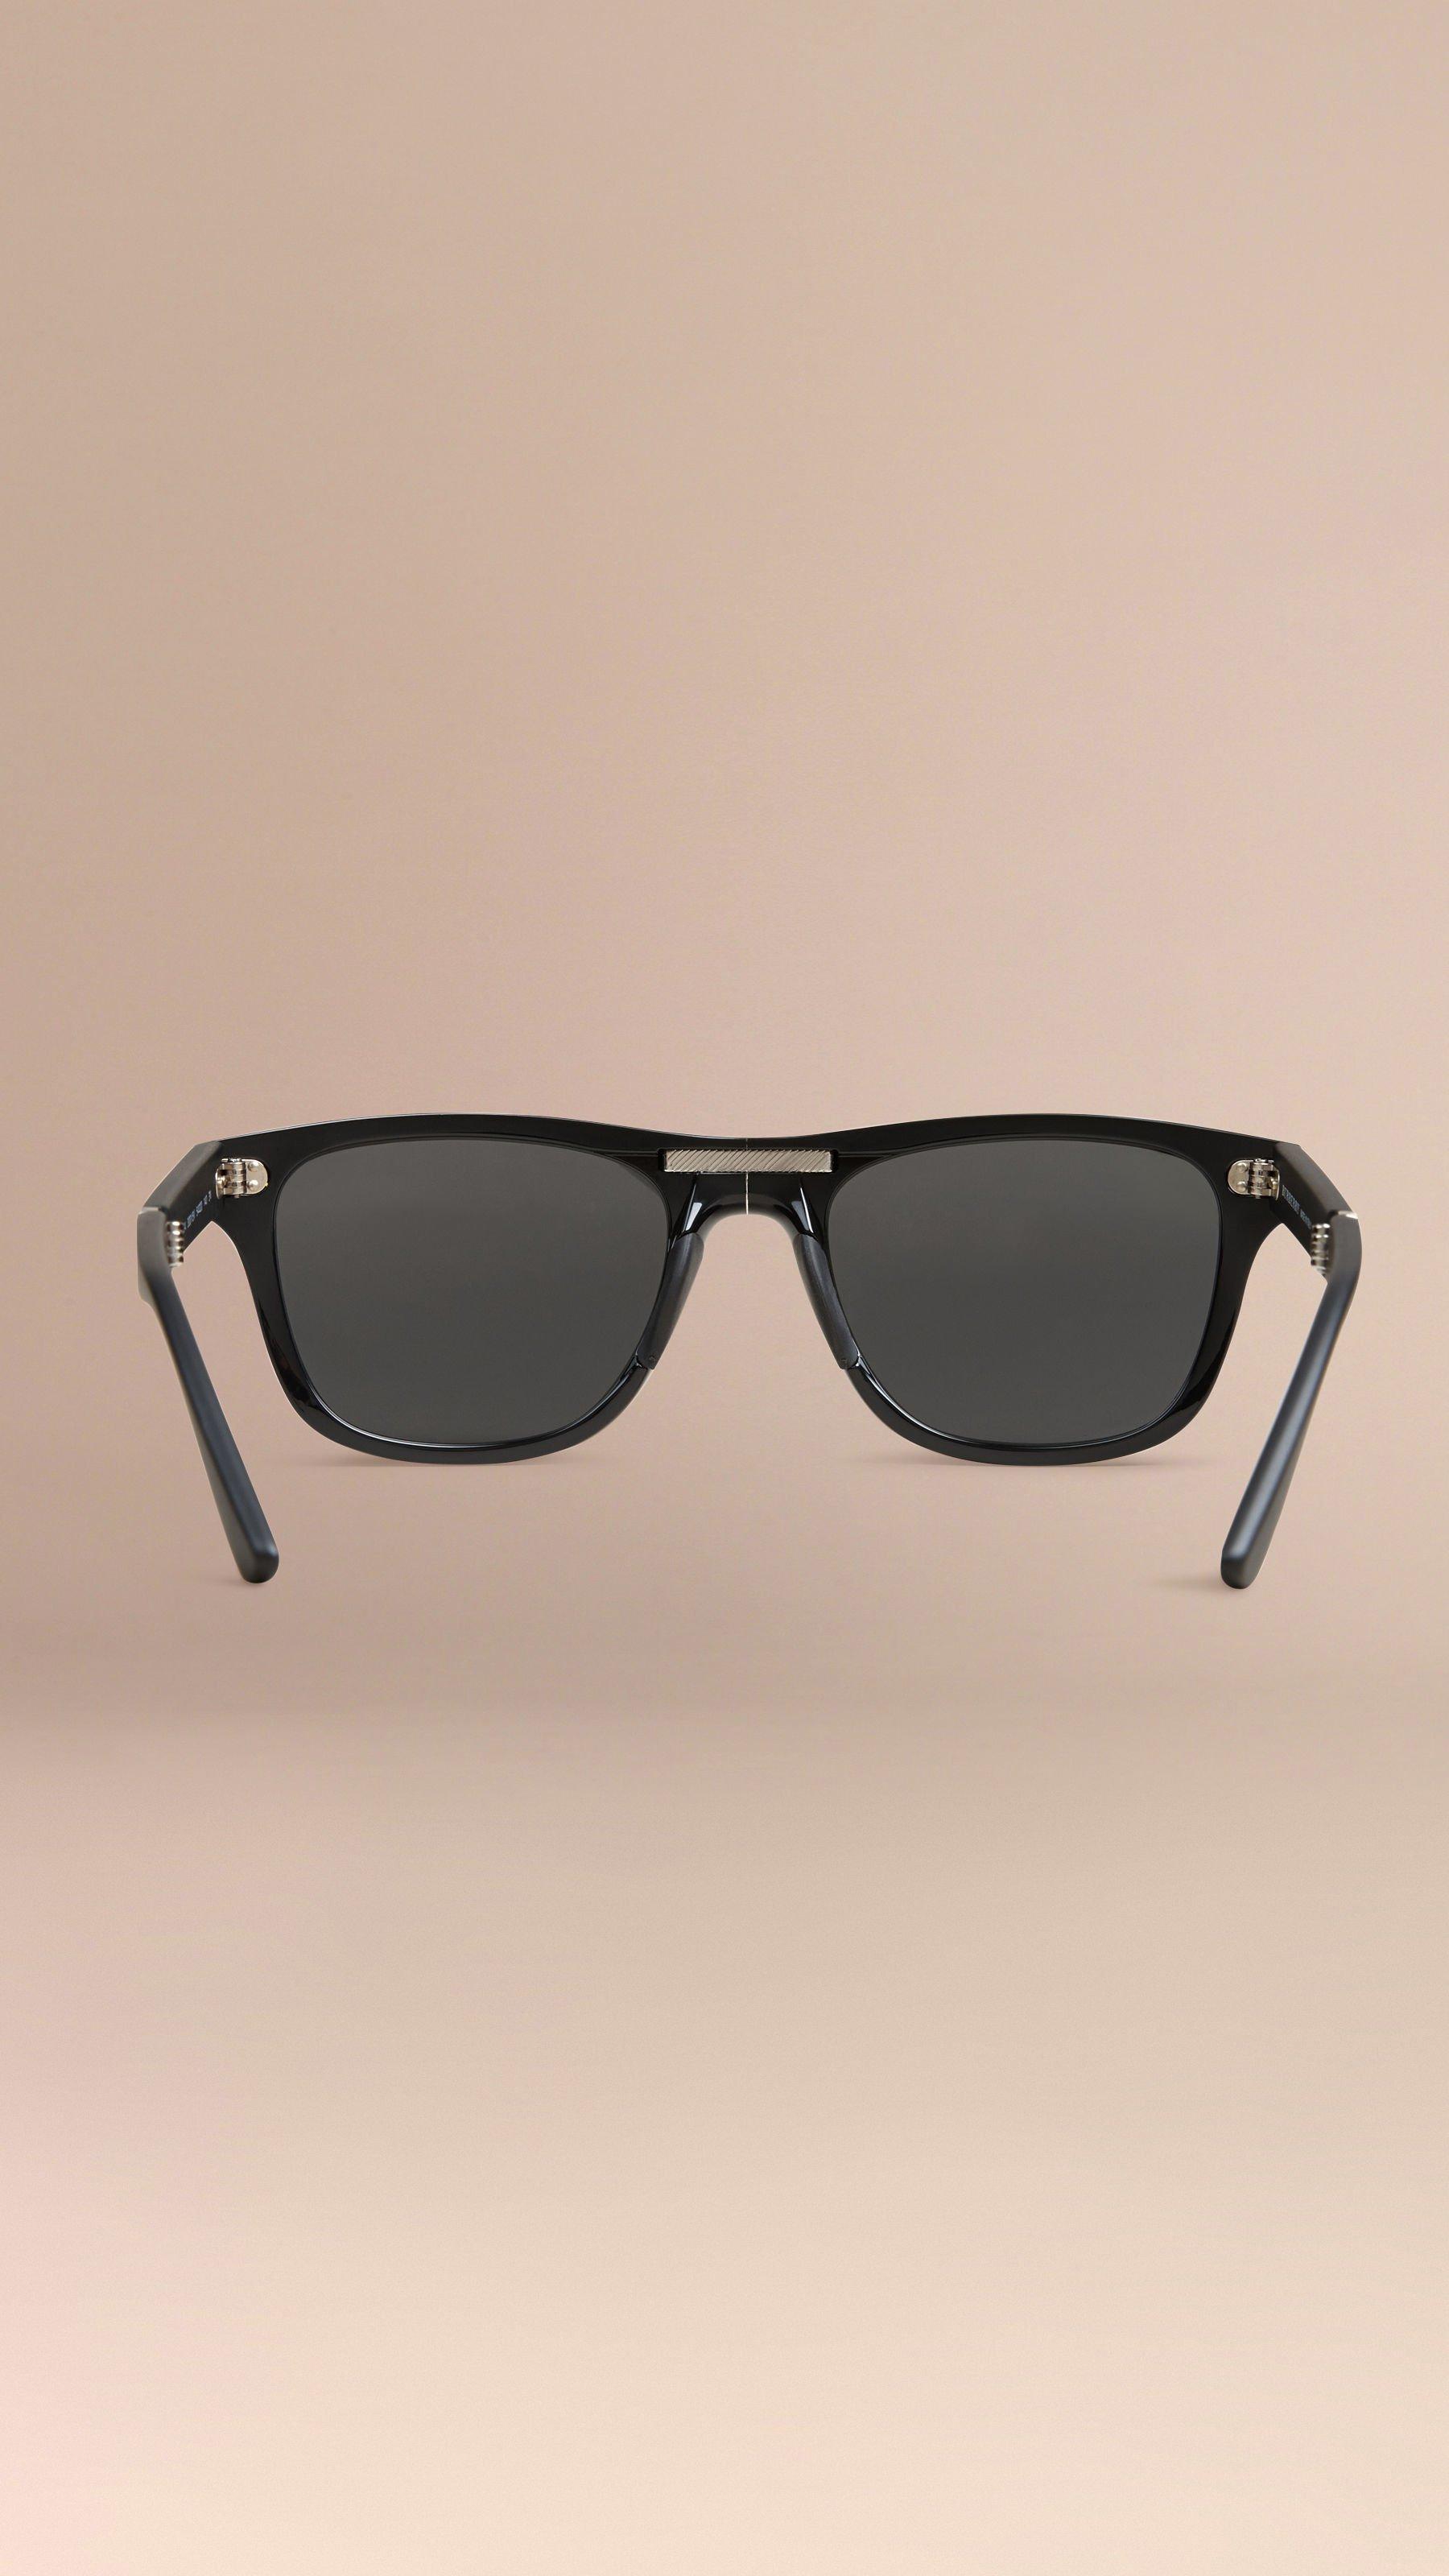 69a33138cde64 Burberry Sunglasses Price In India